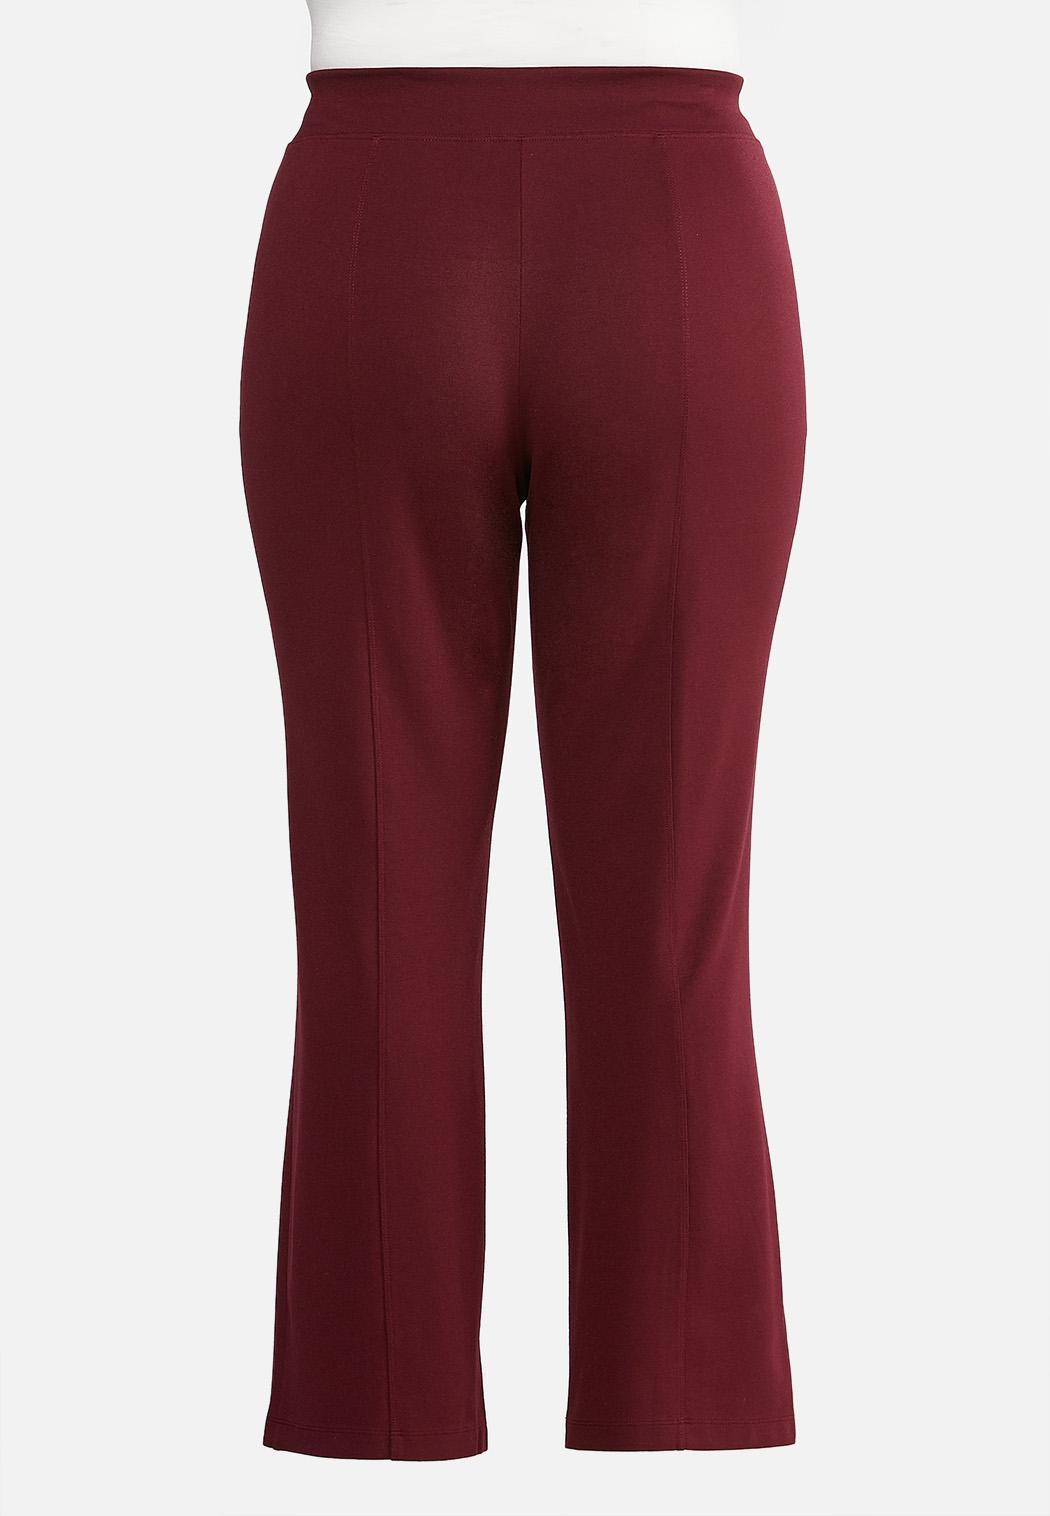 Plus Petite Slim Bootcut Ponte Pants (Item #43956866)